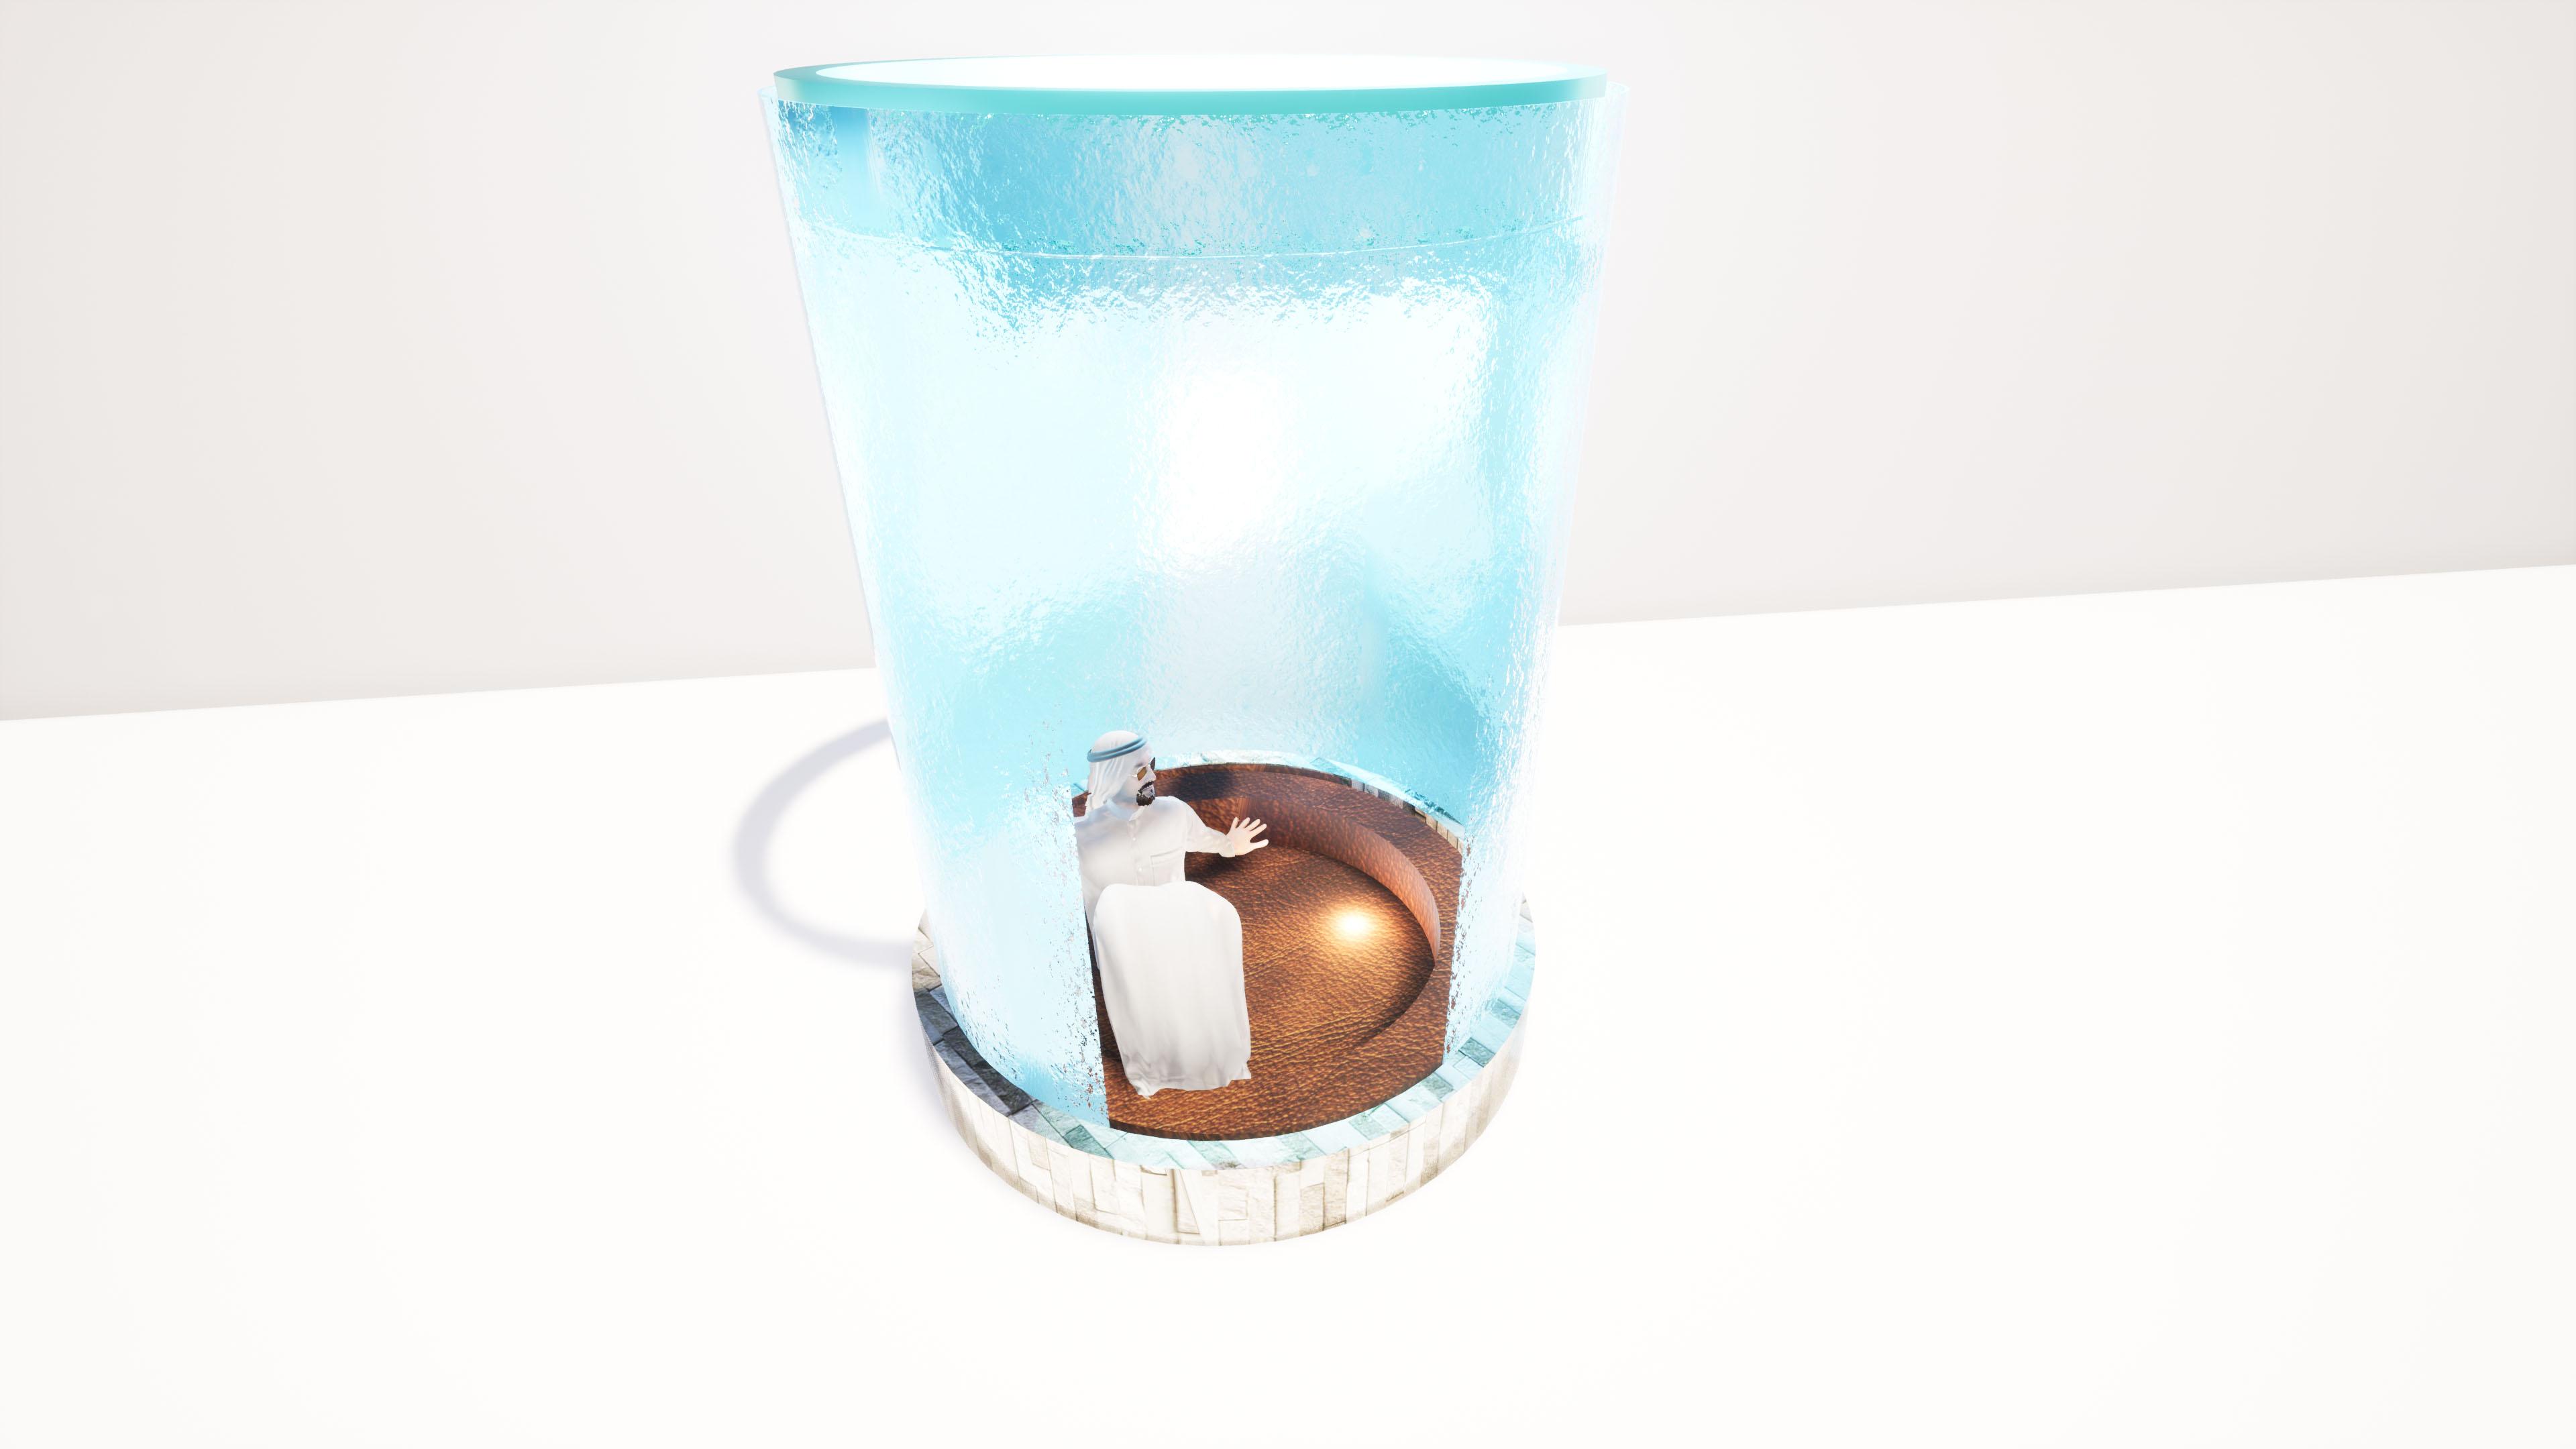 Water cube design